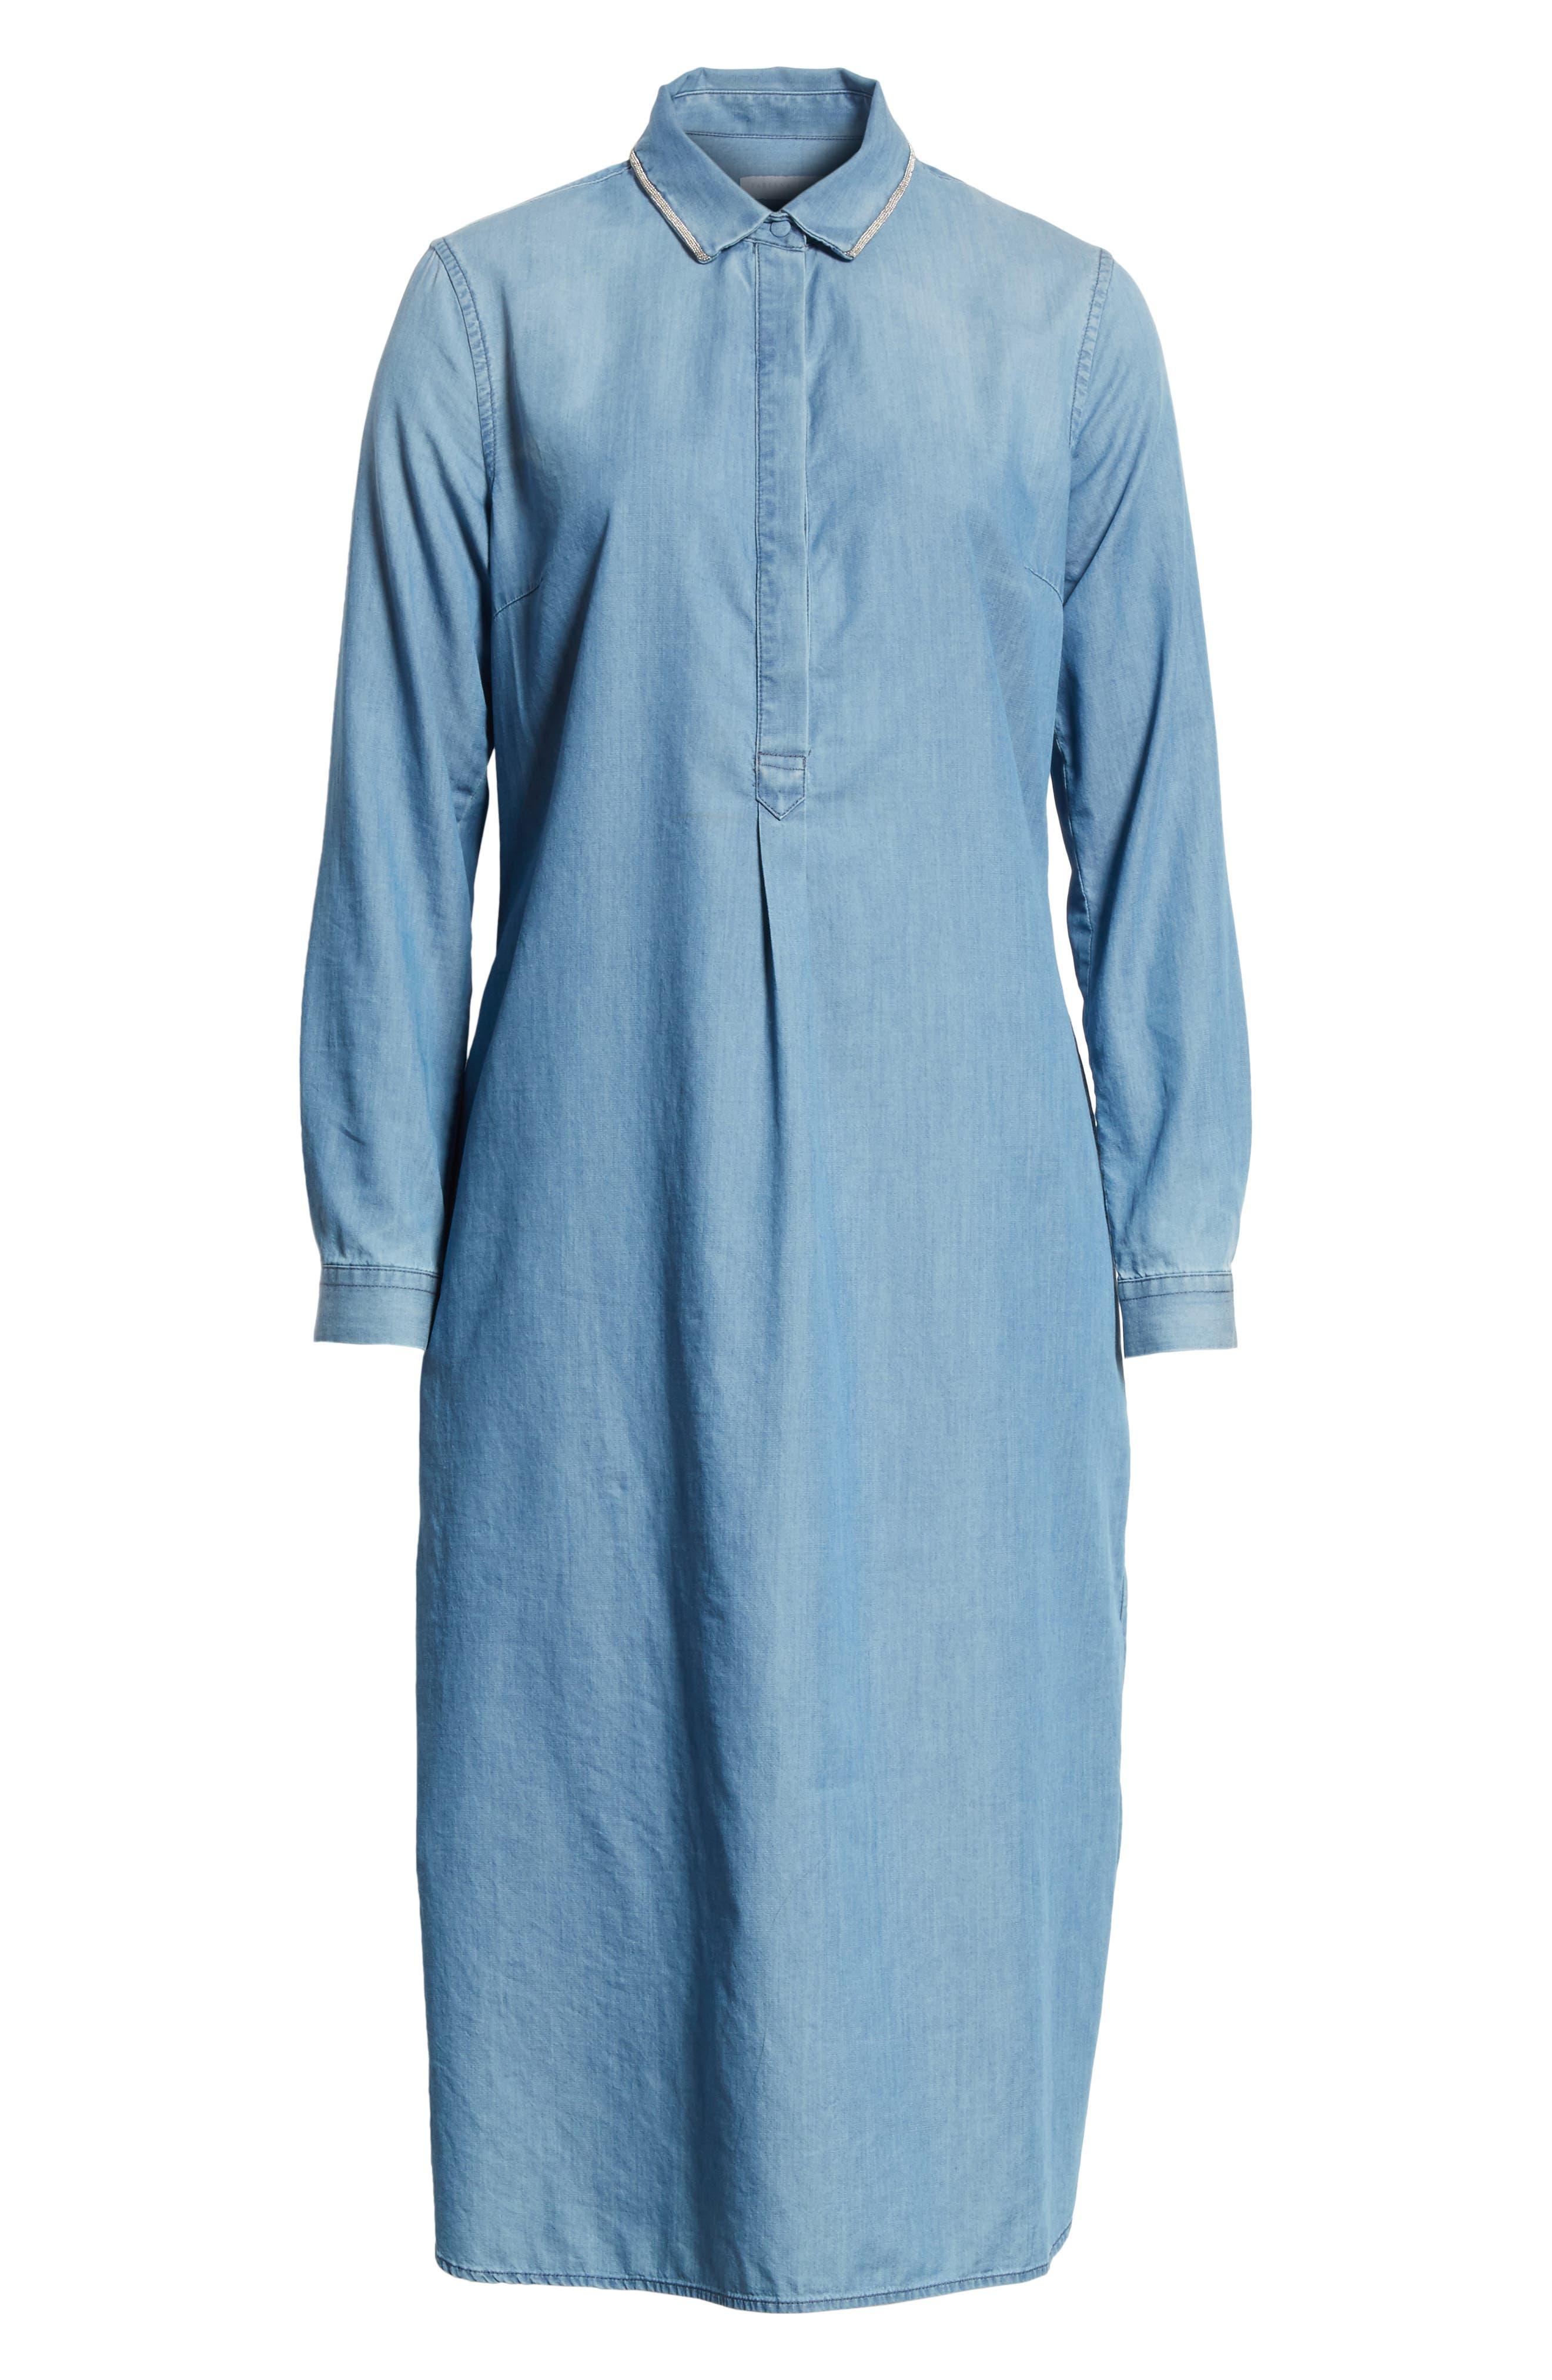 Cotton & Cashmere Chambray Shirtdress,                             Alternate thumbnail 6, color,                             400